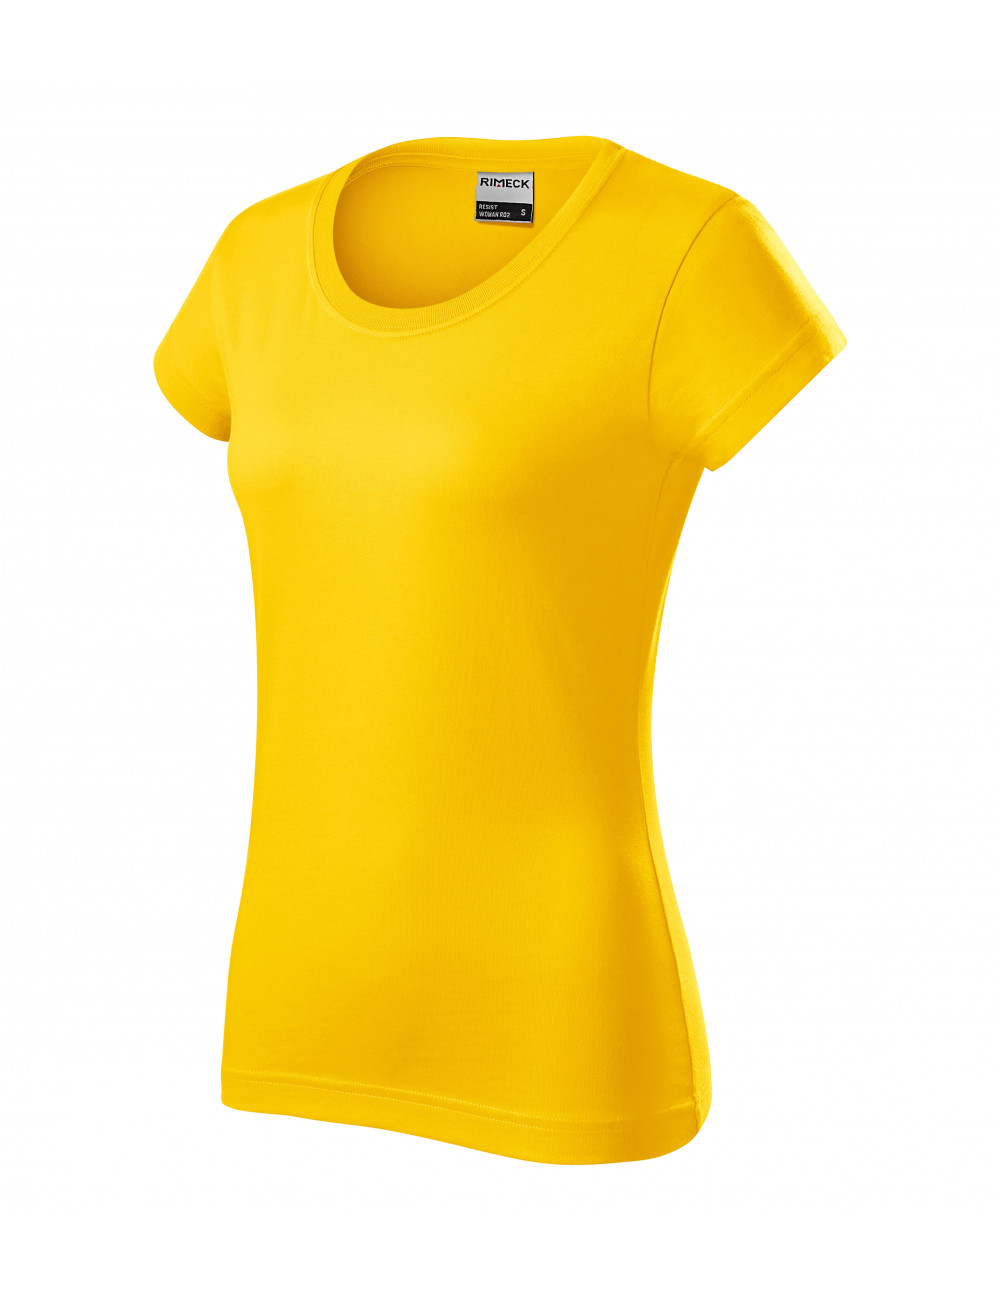 Adler RIMECK Koszulka damska Resist heavy R04 żółty